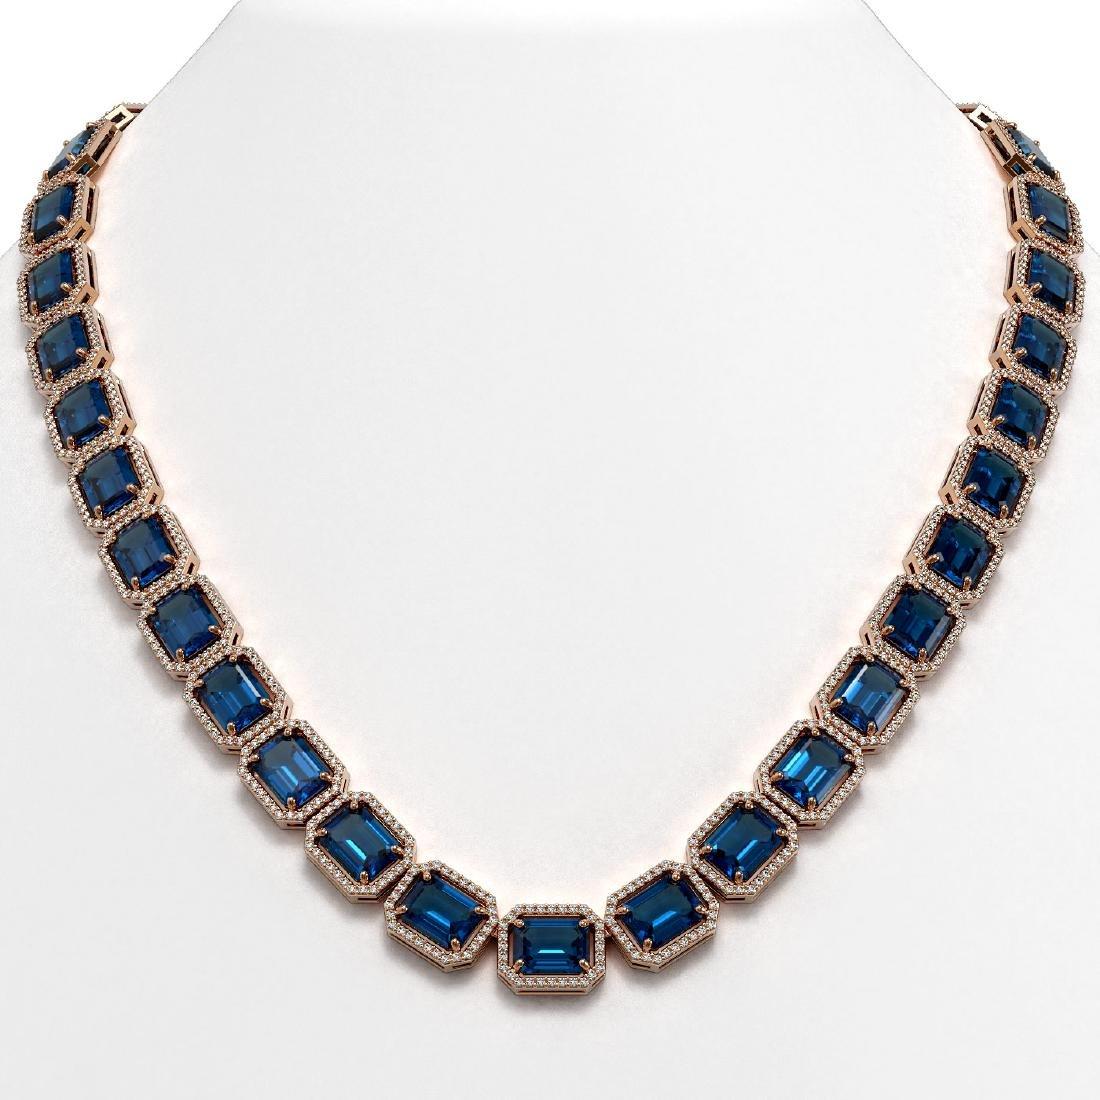 79.66 CTW London Topaz & Diamond Halo Necklace 10K Rose